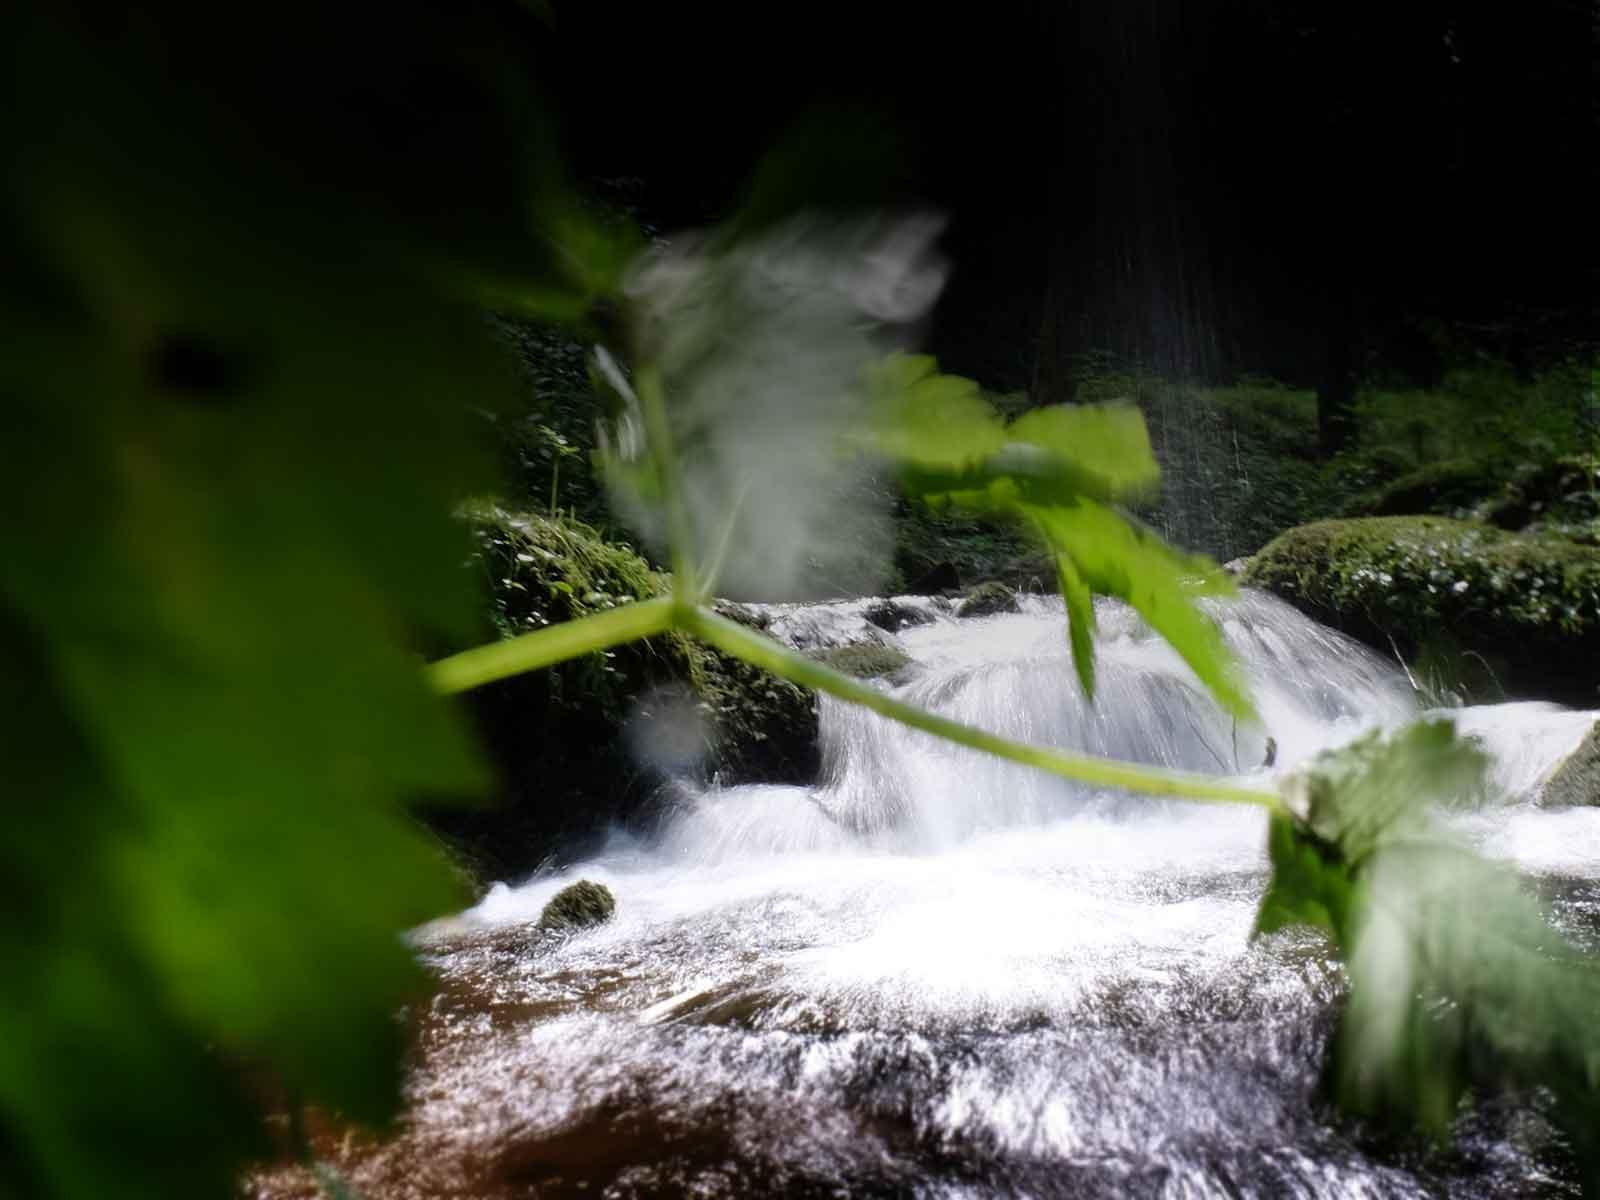 Carsharing Zukunft Teilen Natur Wasserfall 2